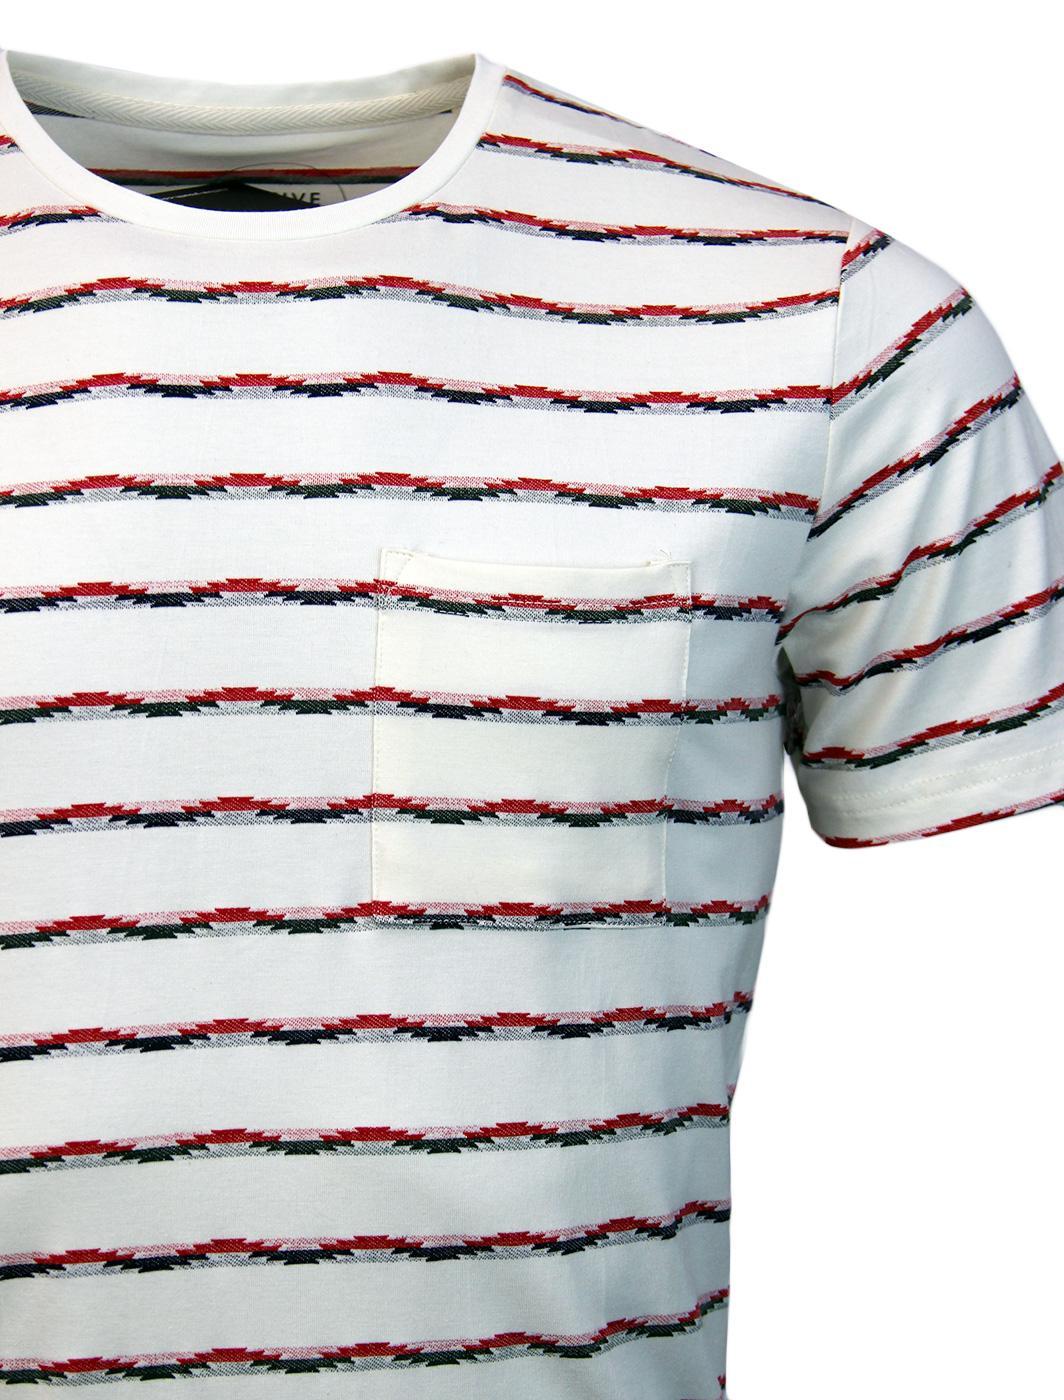 4fa20e61645 NATIVE YOUTH Retro Indie Jacquard Stripe T-Shirt in Cream